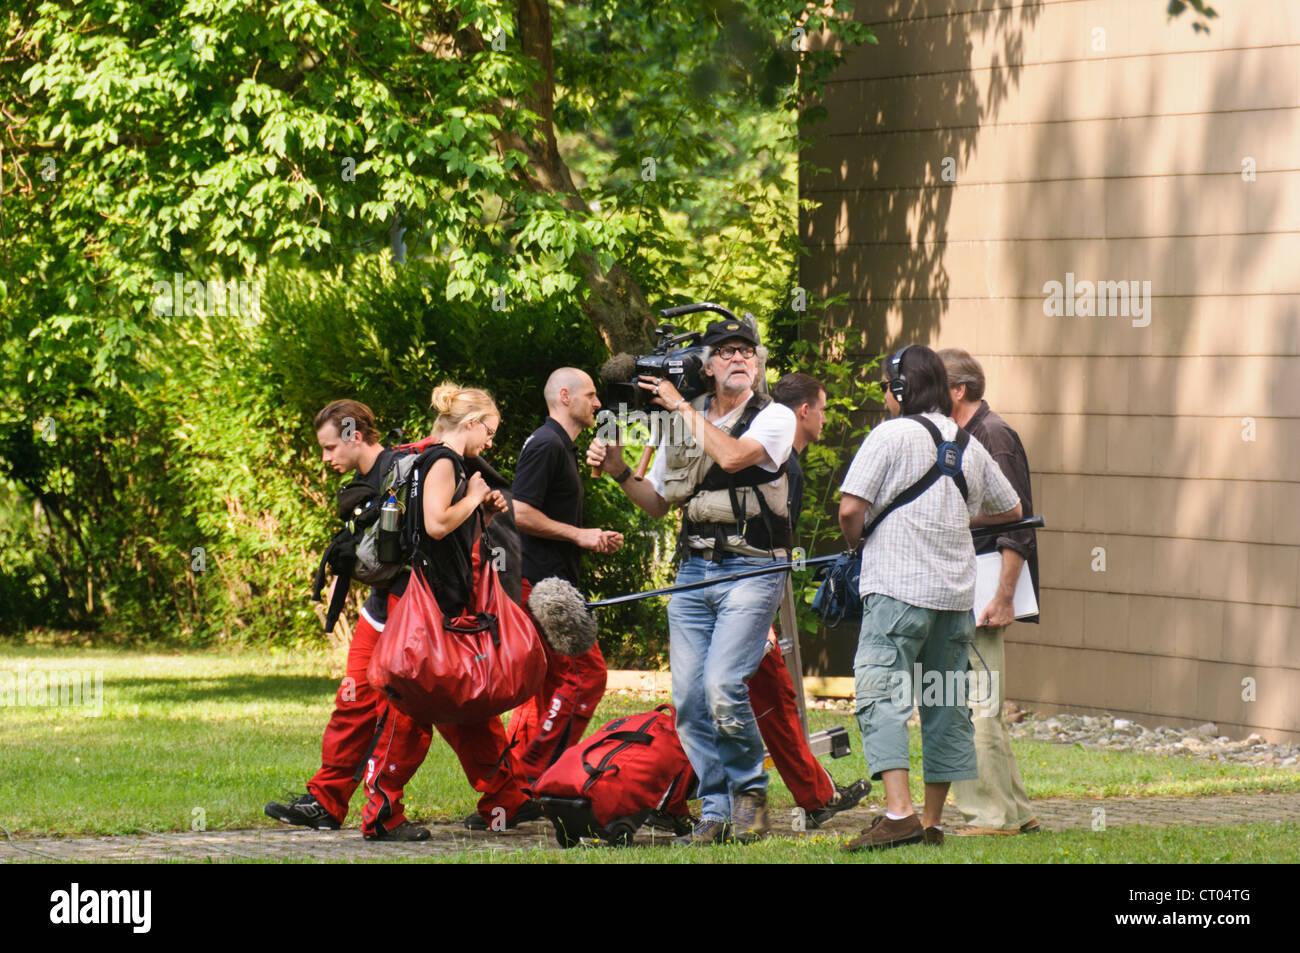 SWR Suedwestrundfunk Camera Crew Cameraman Director Sound Engineer Documentary Reportage - Heilbronn Germany - Stock Image